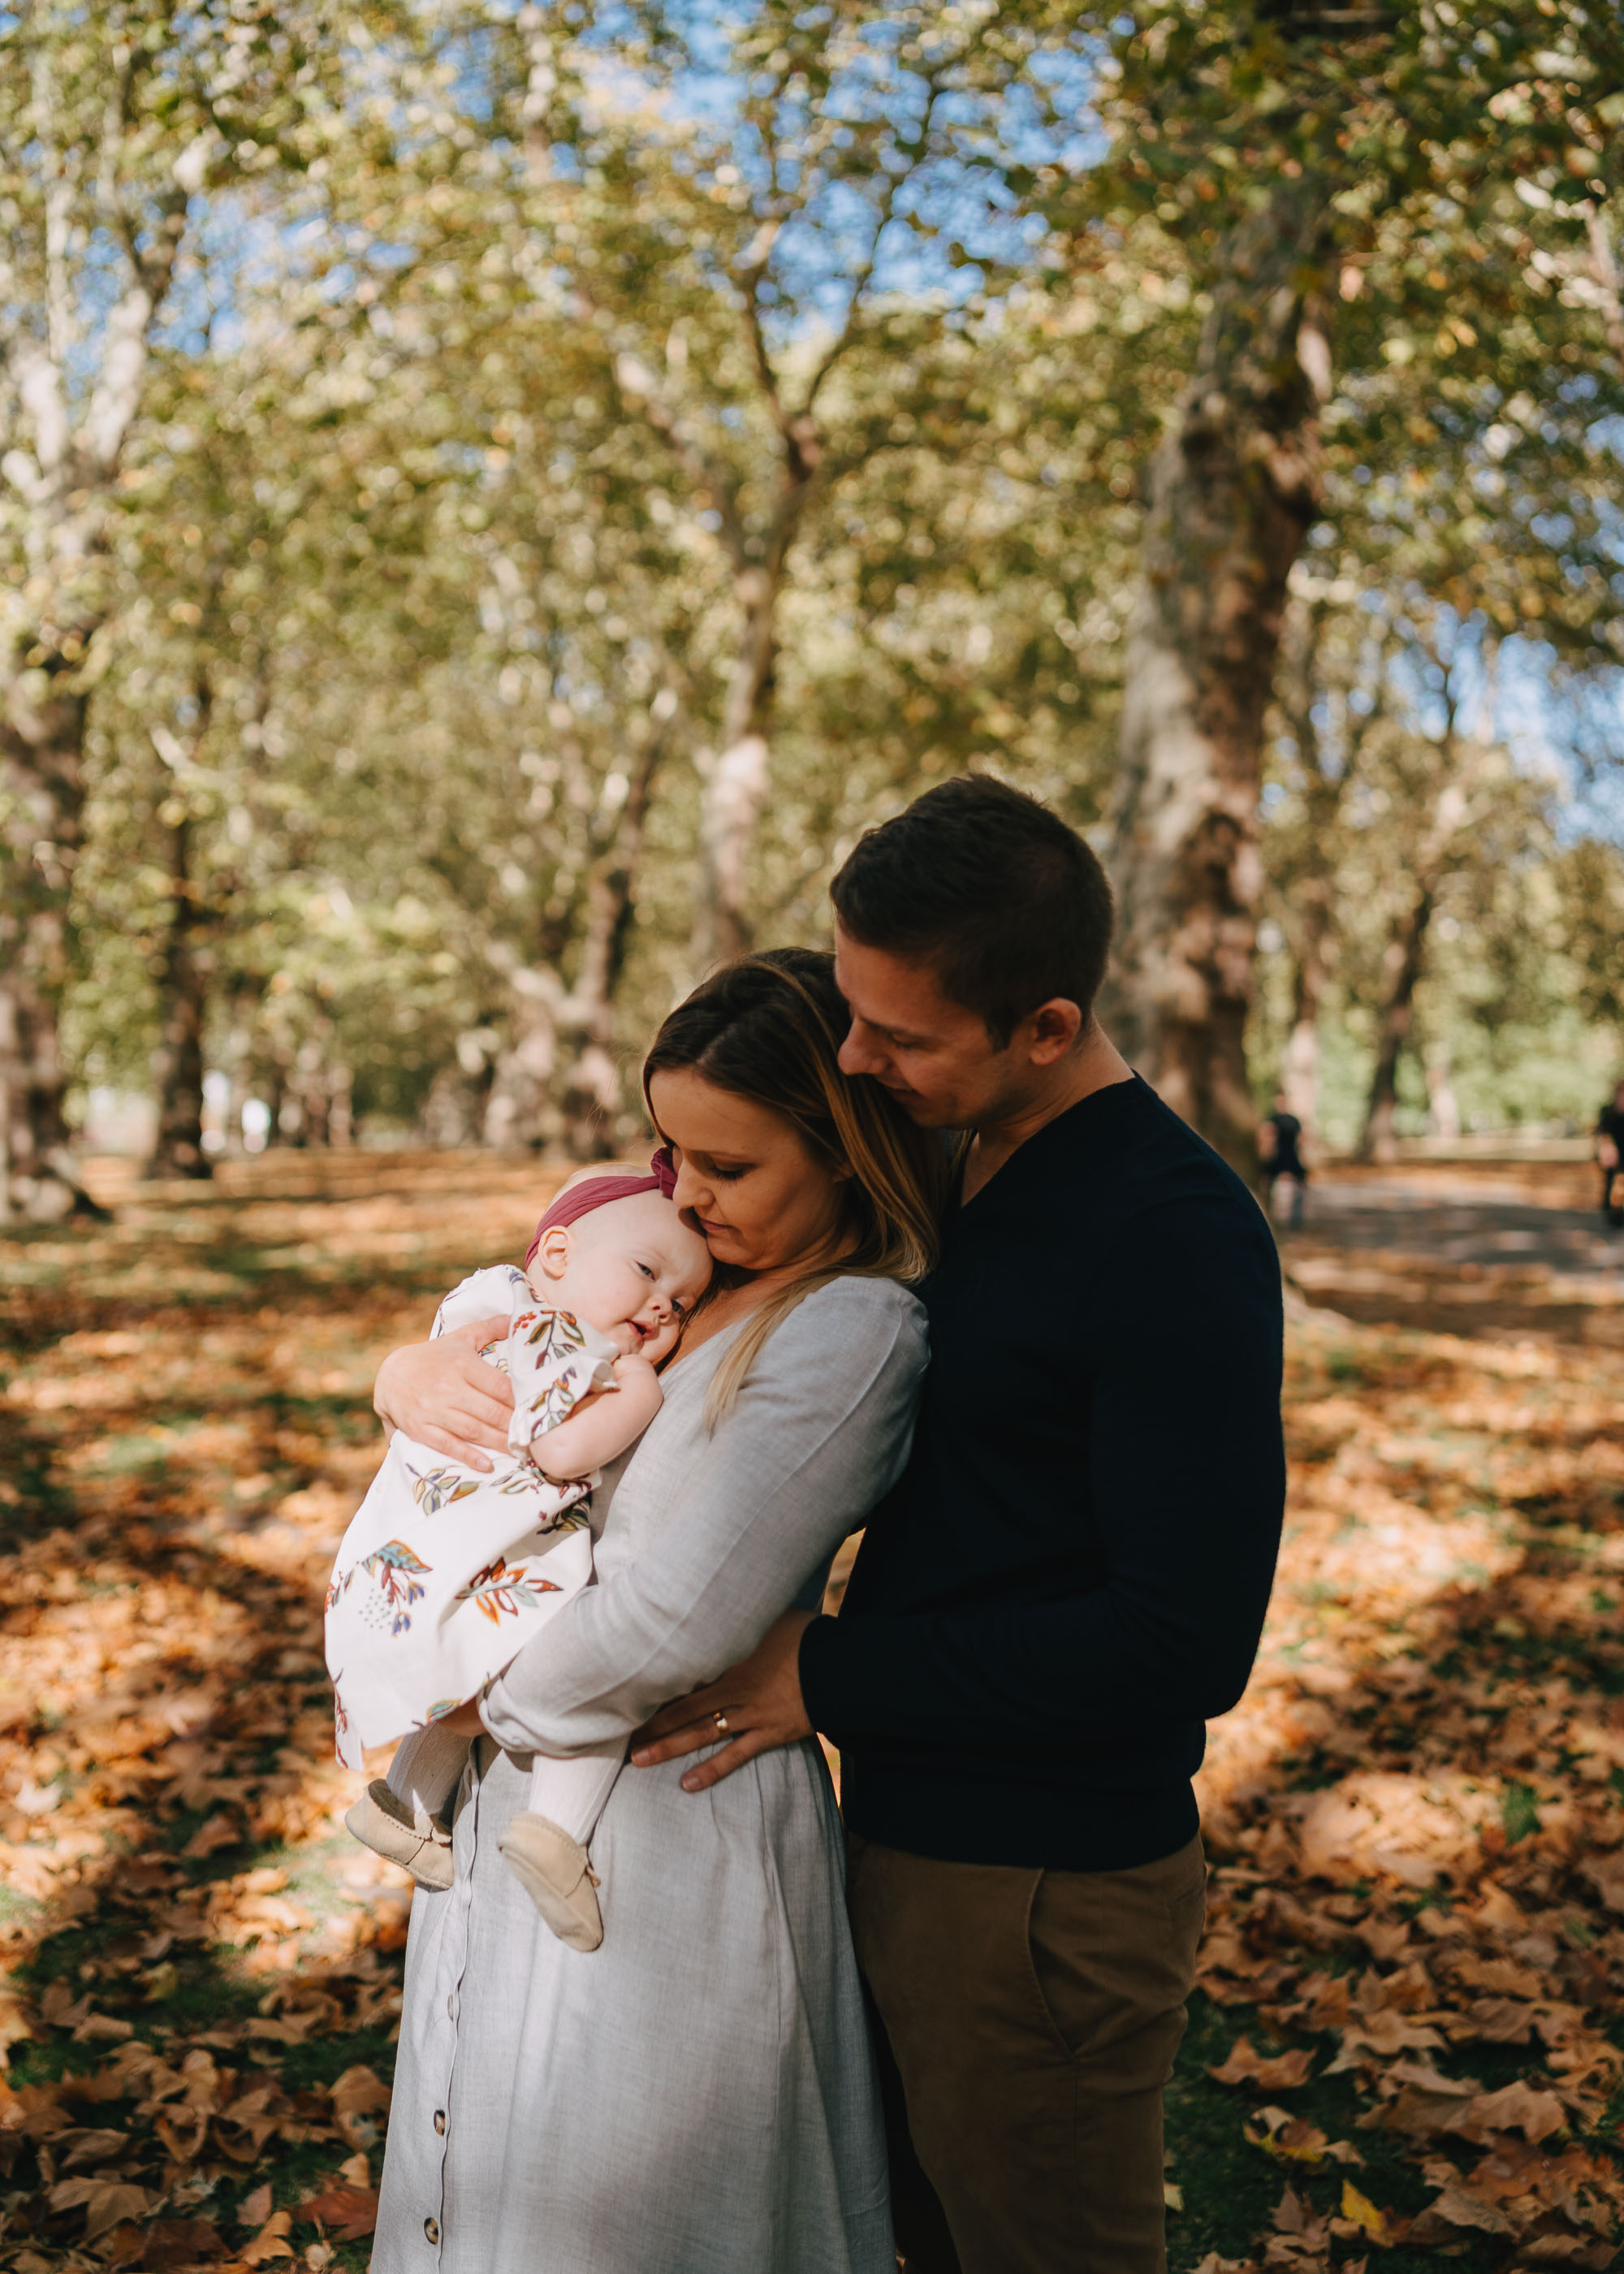 Family Portrait Photographer in London